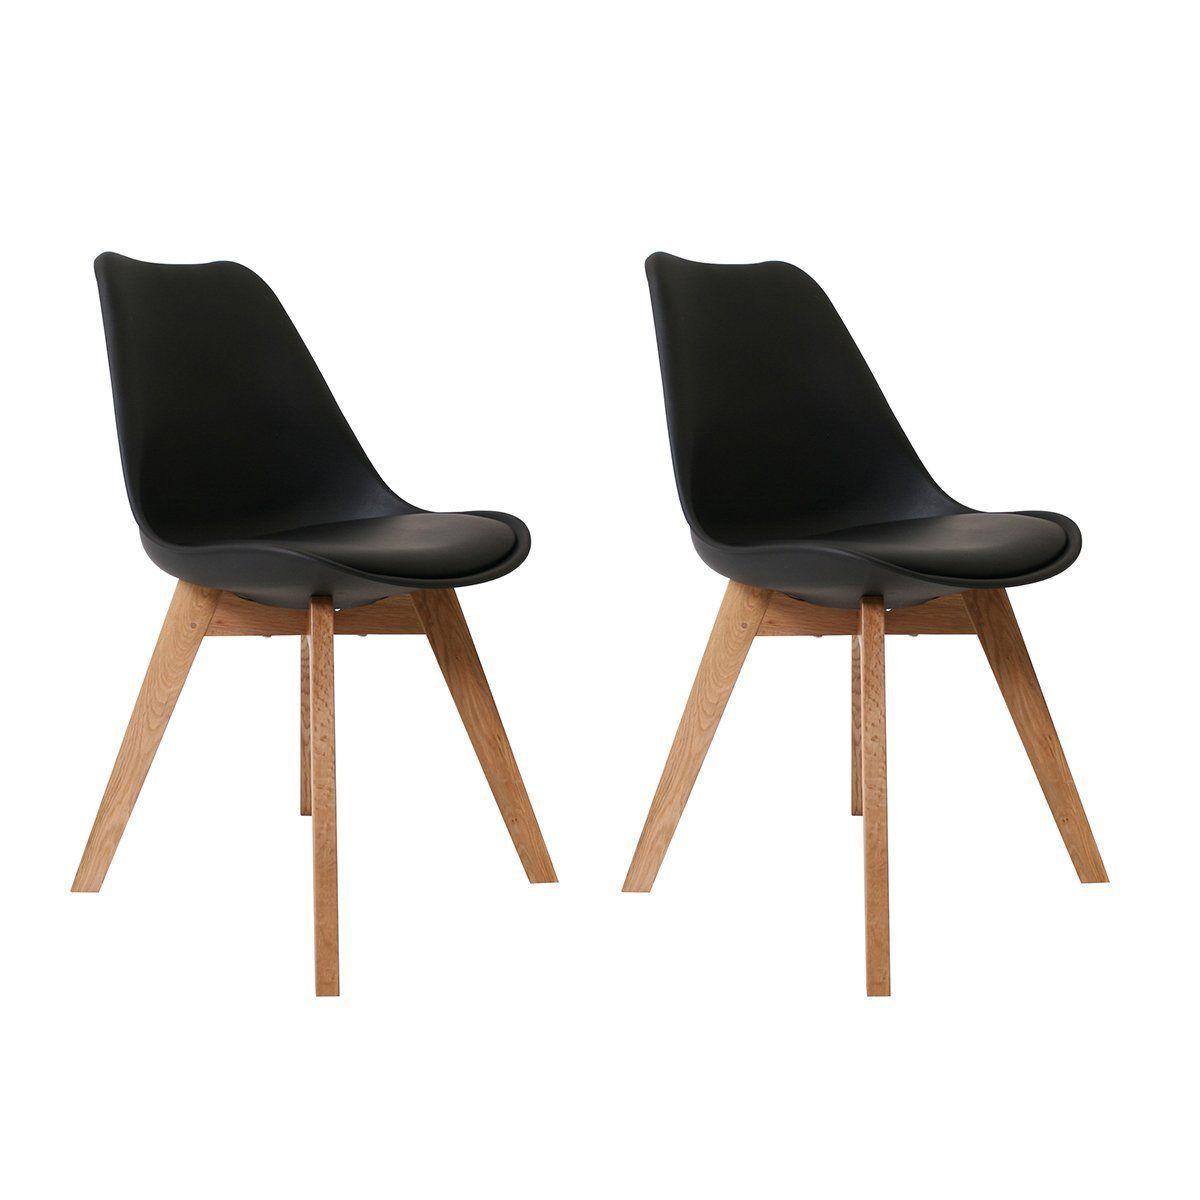 Design Esszimmerstuhl moderner design esszimmerstuhl consillium valido 2er set holz